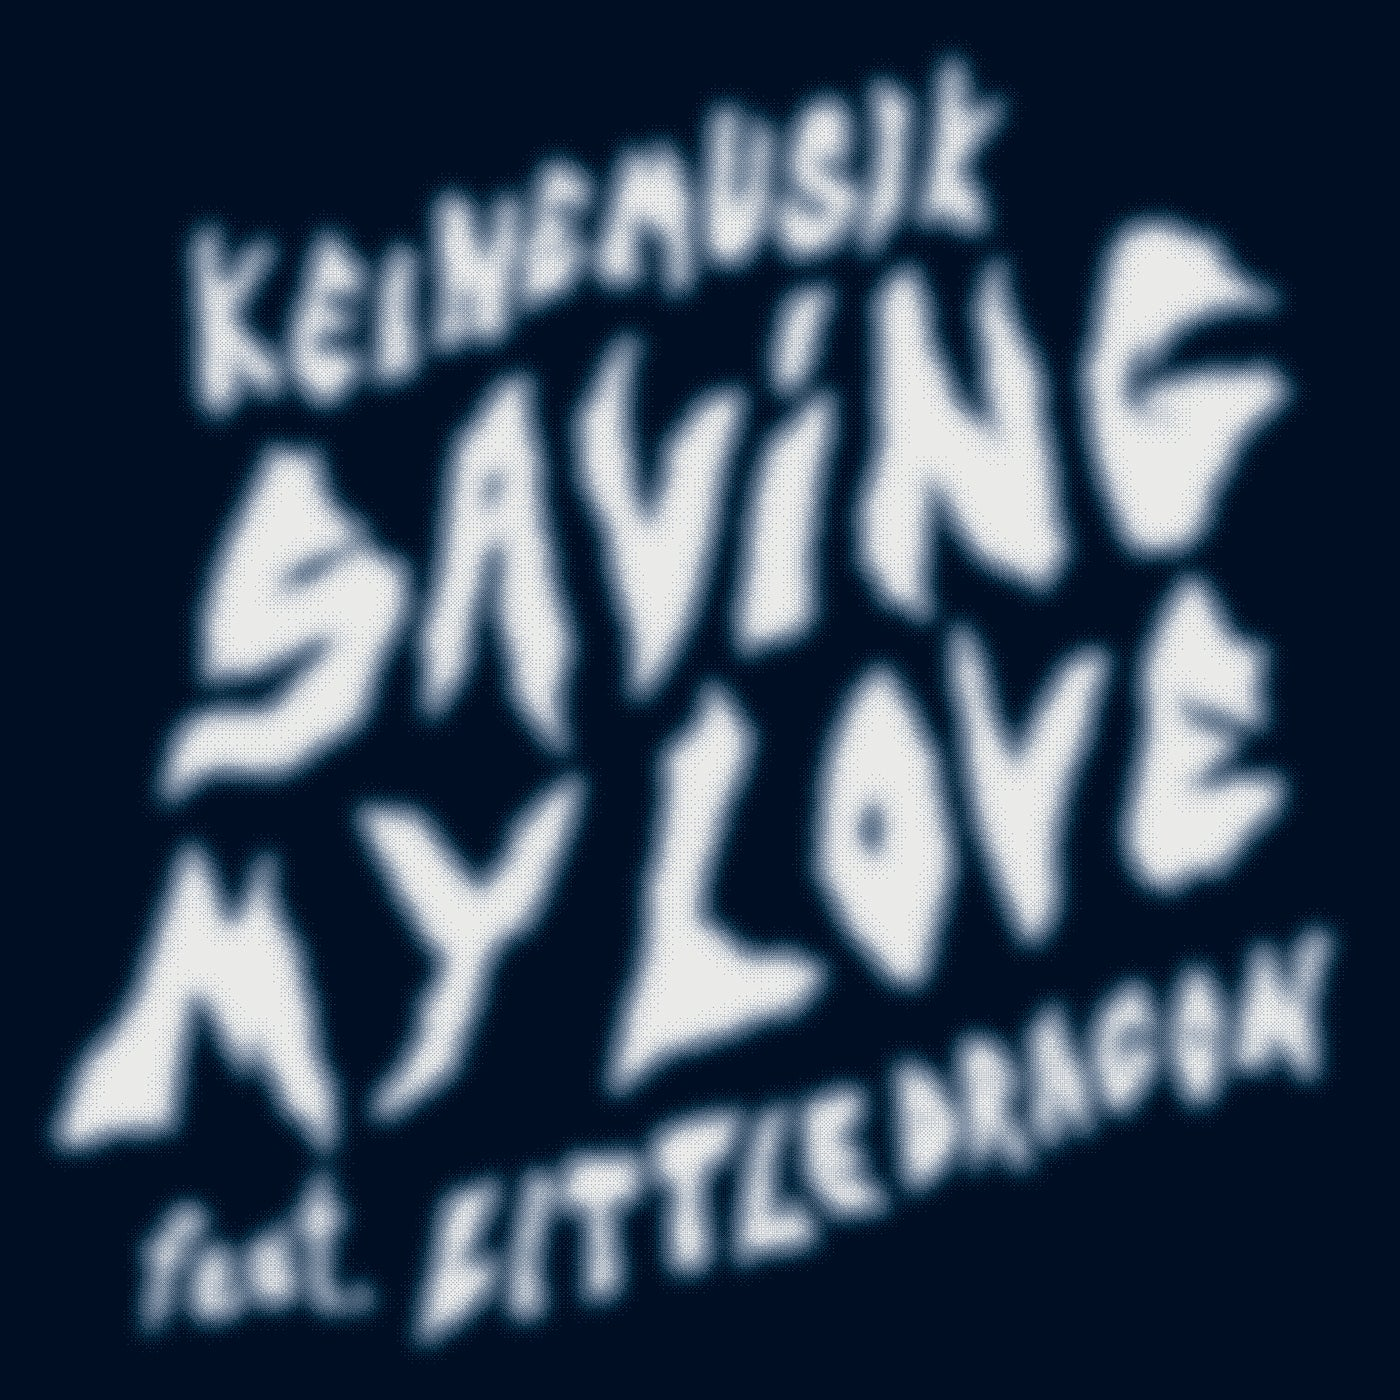 Saving My Love (Original Mix)